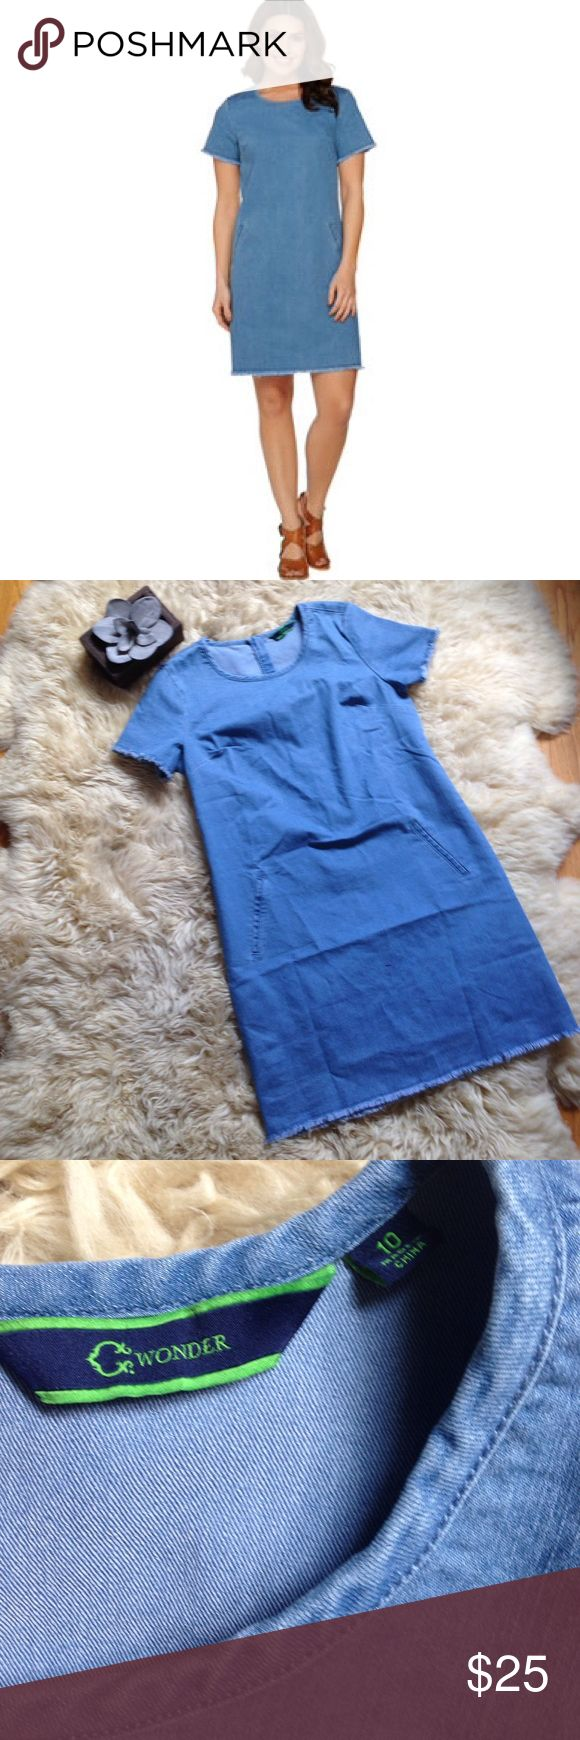 "C. Wonder Short Sleeve Denim Dress C. Wonder Short Sleeve Denim Dress. New without tags. Raw edge details. Front pockets. Back zipper. Unlined. Has stretch. Armpit to armpit is 19""across laying flat. Length is 36"". C. Wonder Dresses"